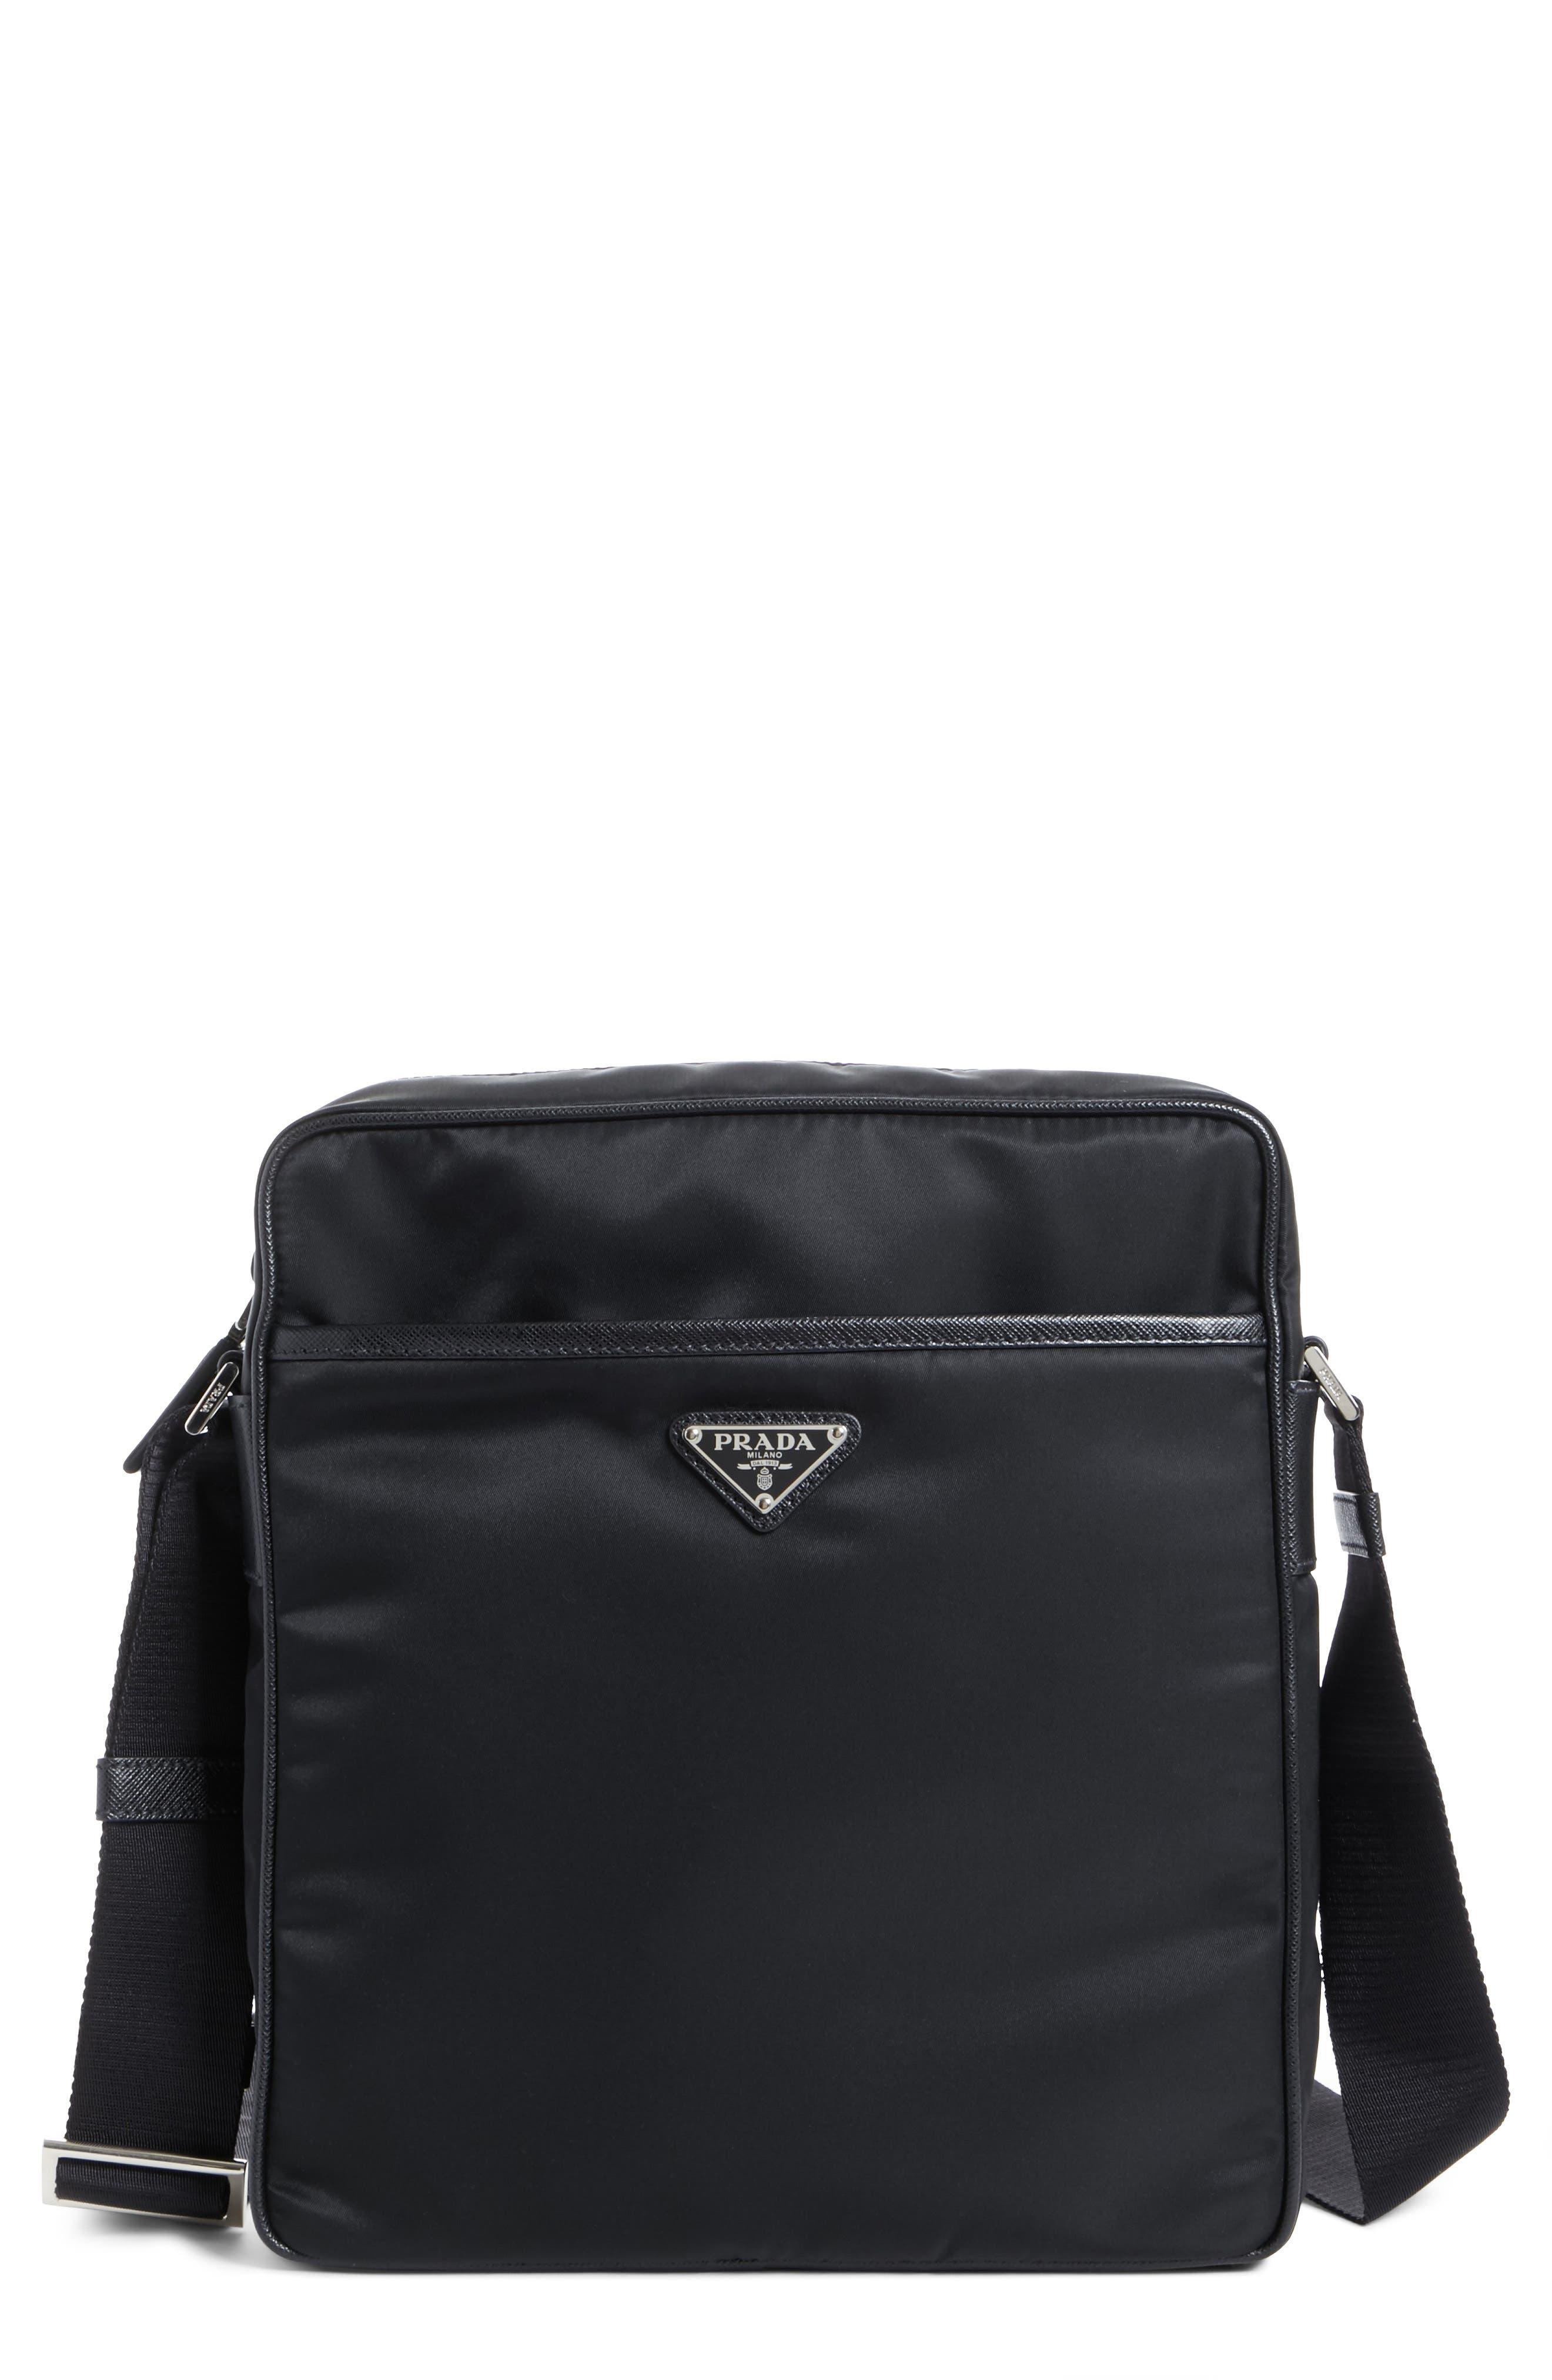 Saffiano Leather Crossbody Bag,                             Main thumbnail 1, color,                             Nero